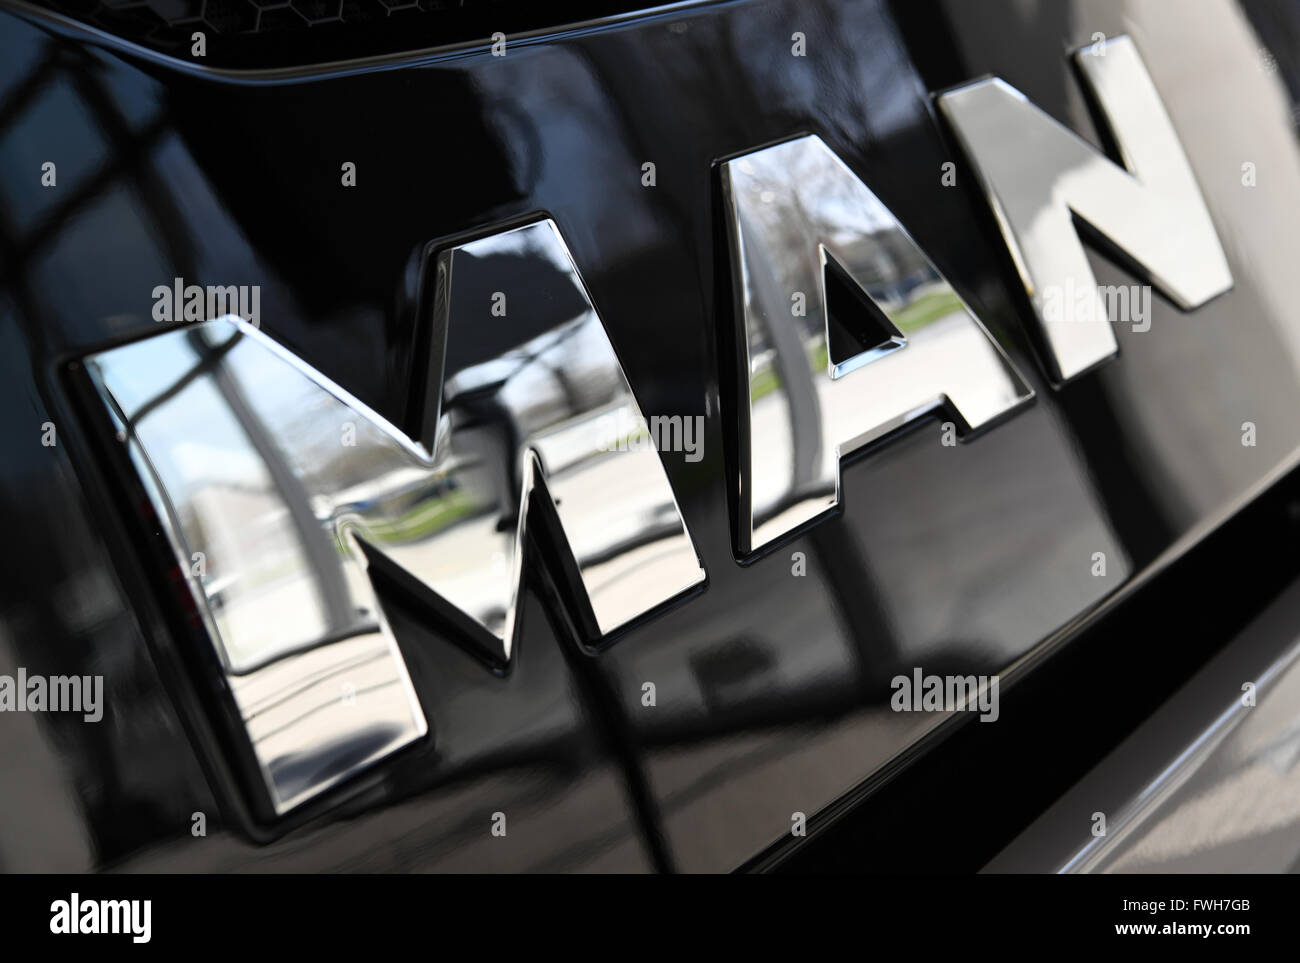 Munich, Alemania. 04 abr, 2016. Un logotipo de empresa fabricante de camiones MAN, en Munich, Alemania, 04 de abril de 2016. Foto: PETER KNEFFEL/dpa/Alamy Live News Foto de stock